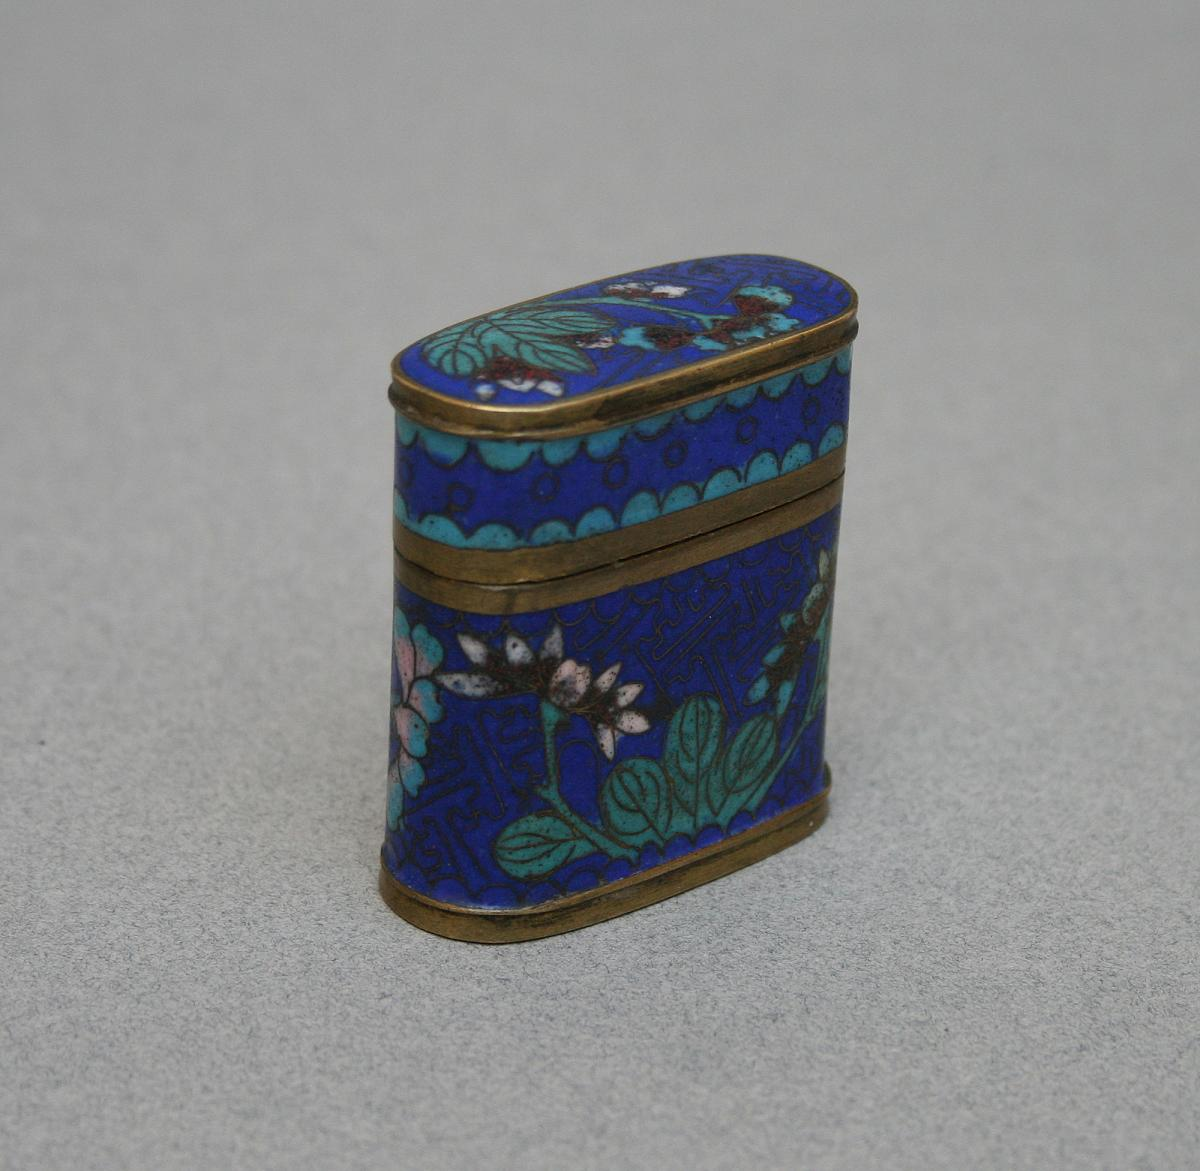 Ancien Boite Opium Chinoise Cloisonne Chine